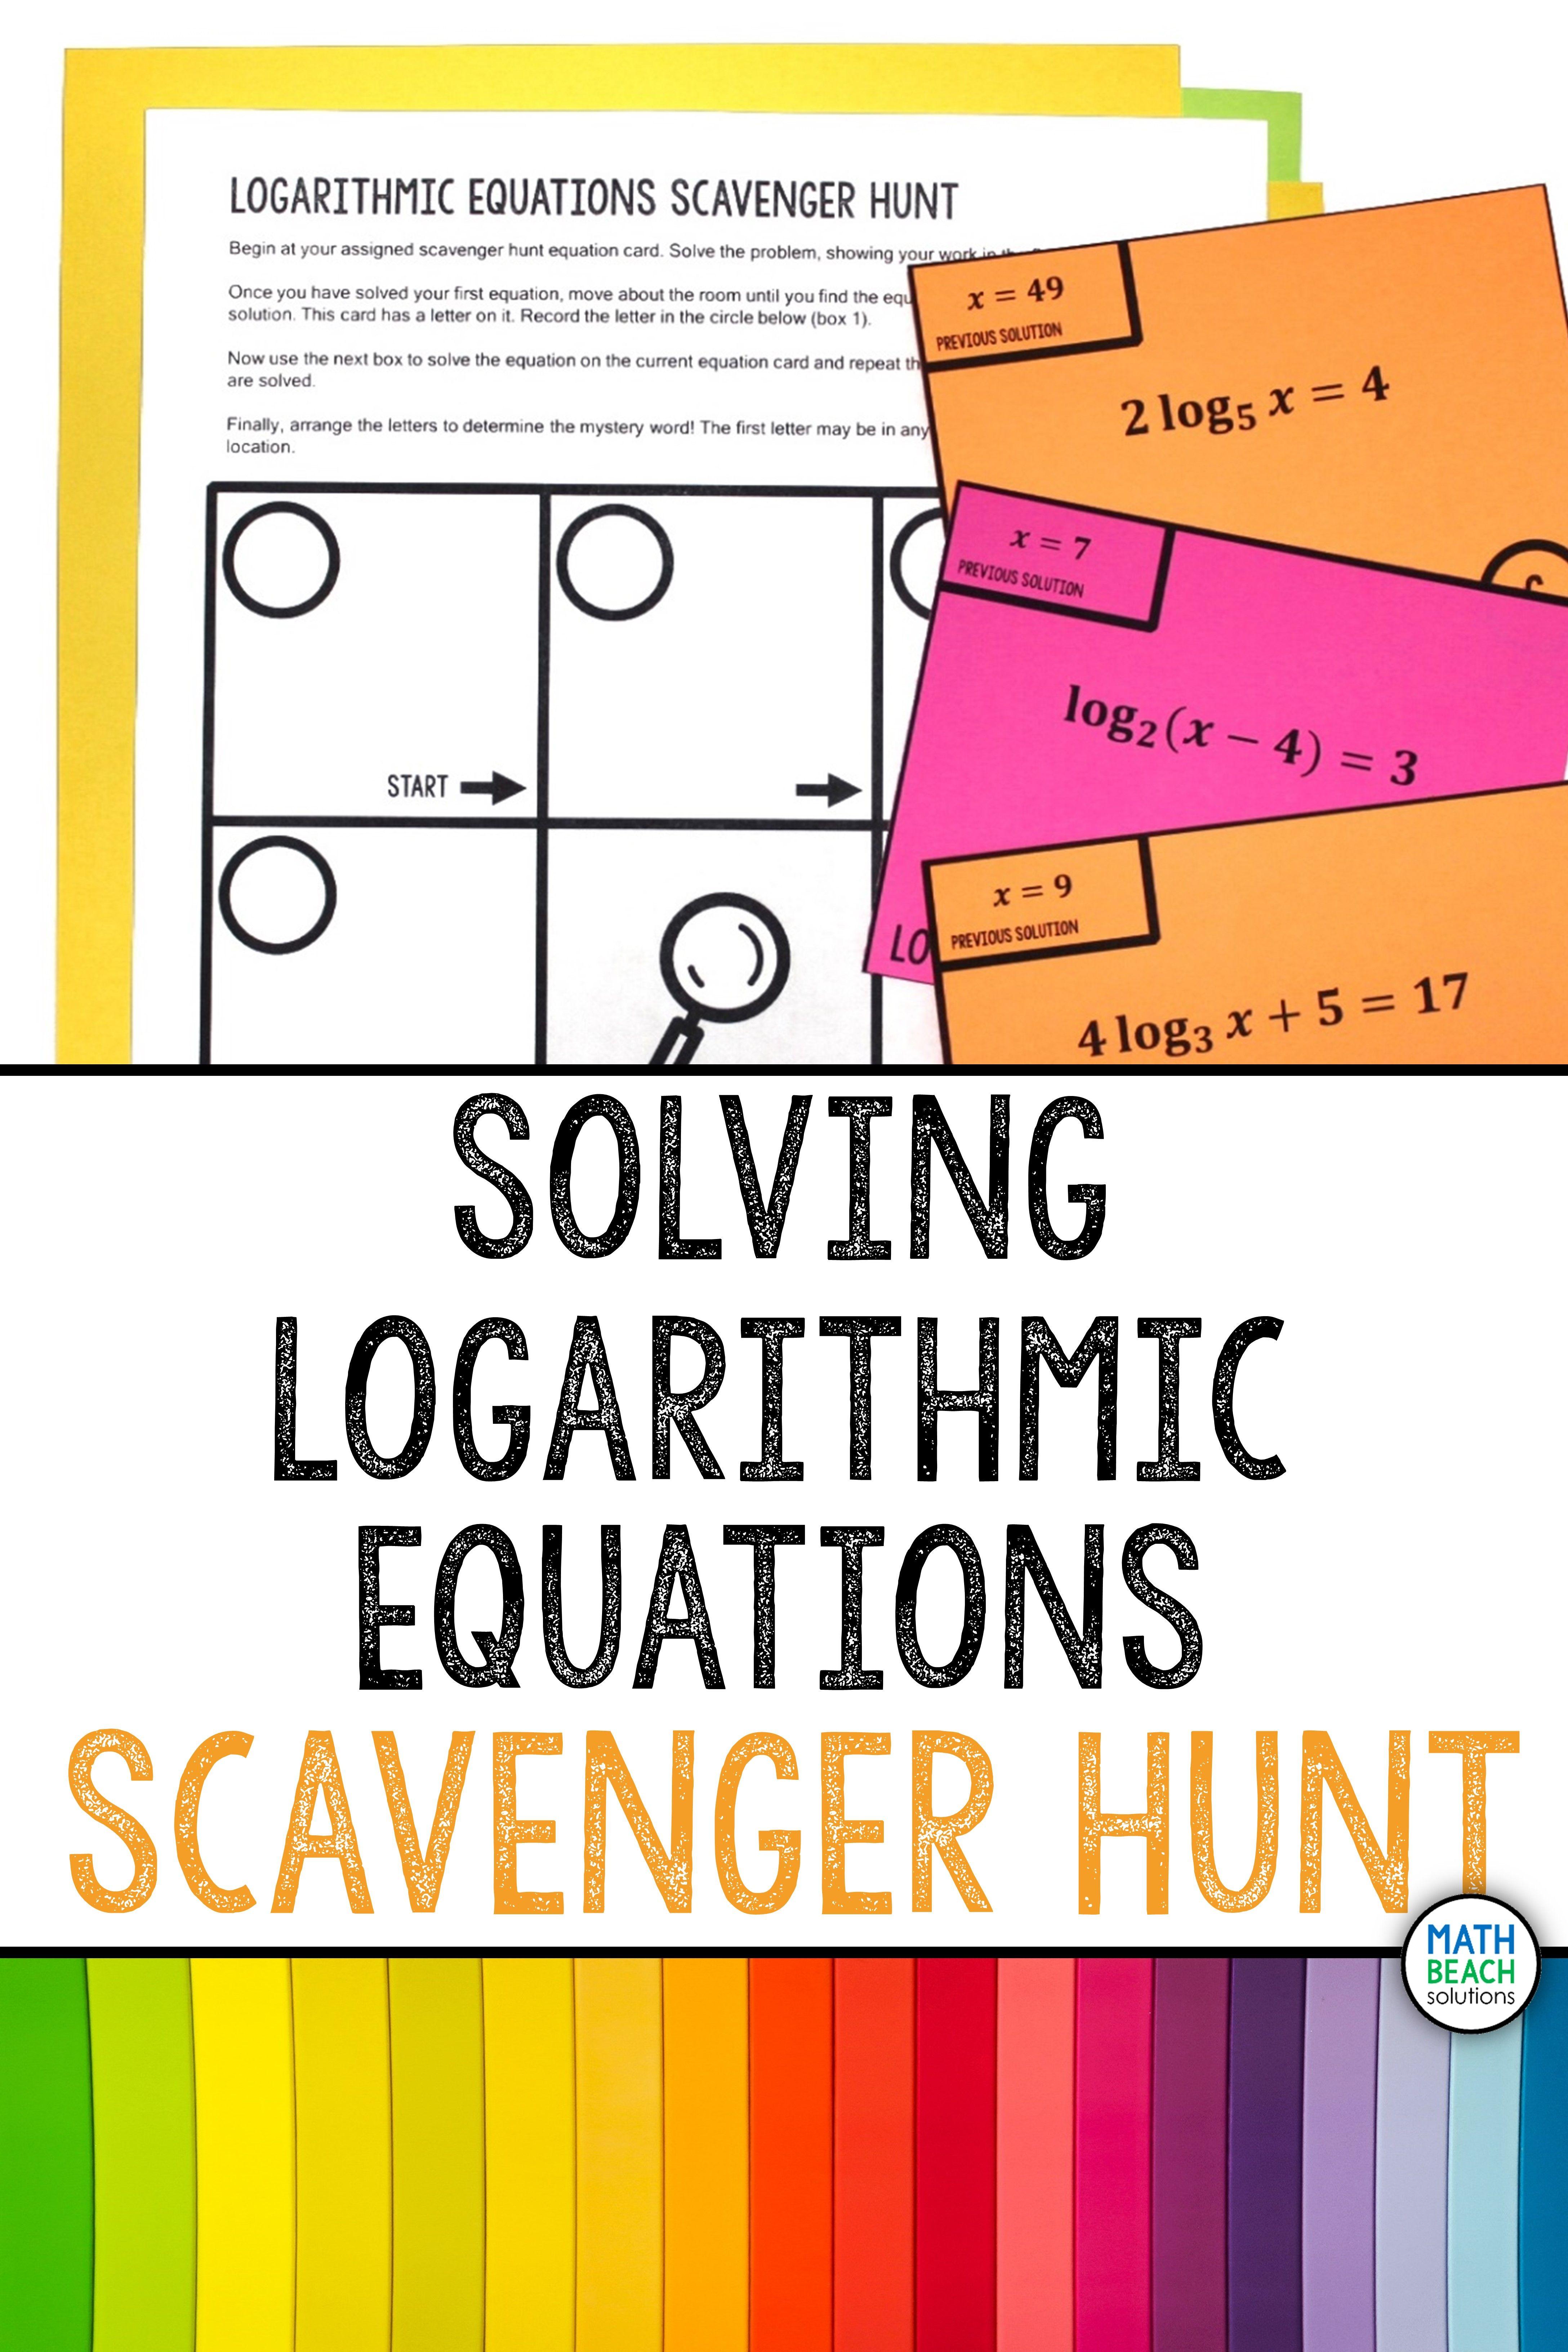 Pin on Algebra 2 Activities